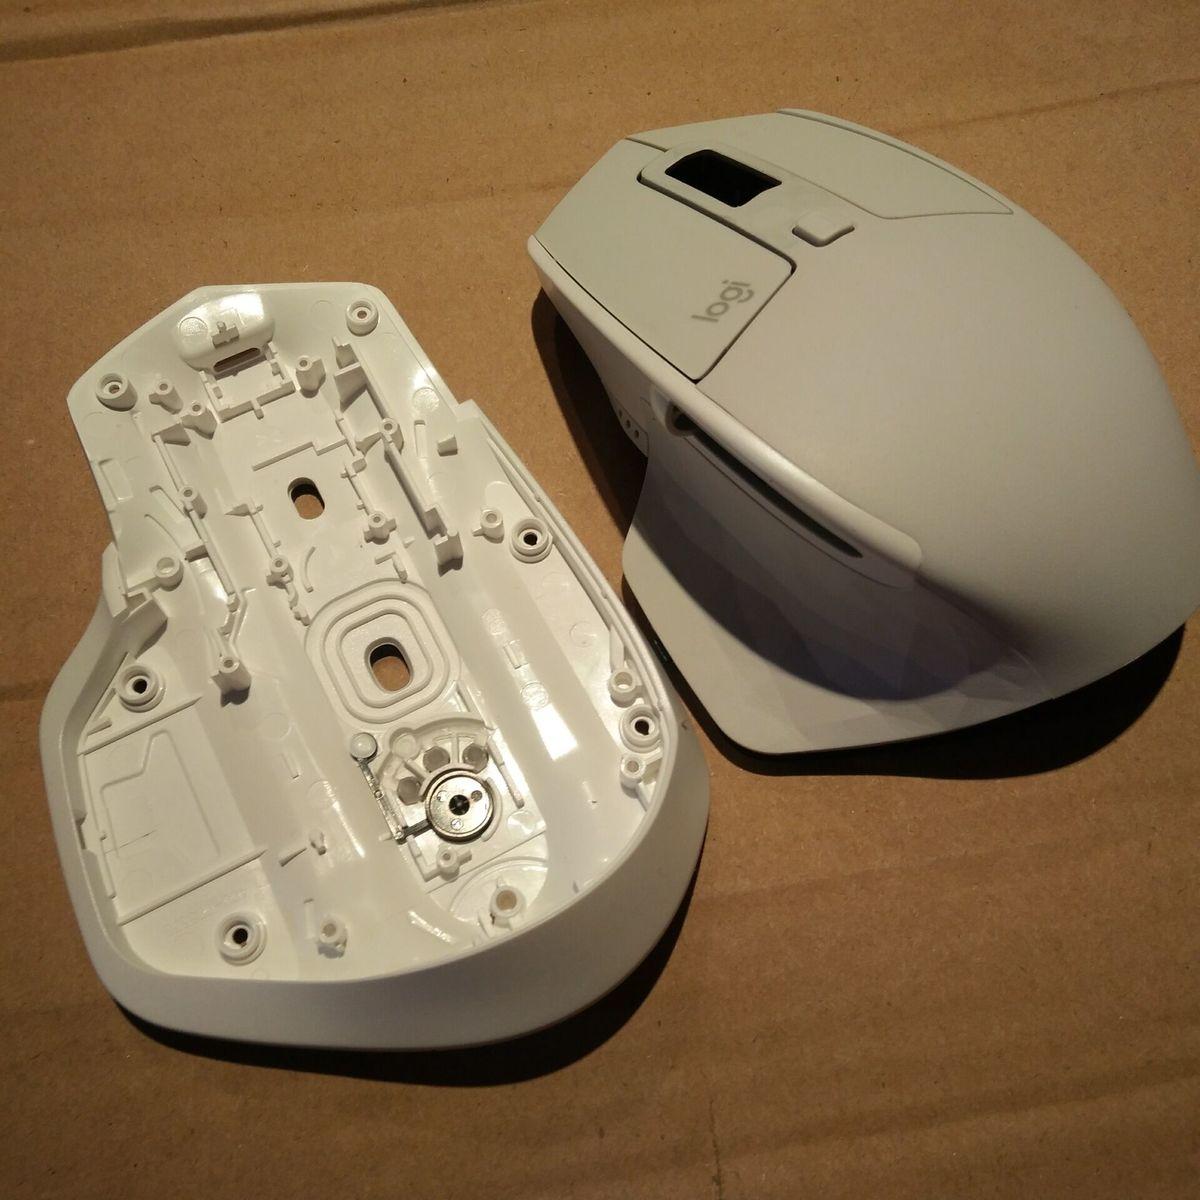 1 Set Asli Mouse Shell Perumahan Untuk Logitech Mx Madcatz Rat9 Wireless Gaming Putih Master 2 S Kasus Hanya 10 Pcs Dalam Saham Biru Di Mice Dari Komputer